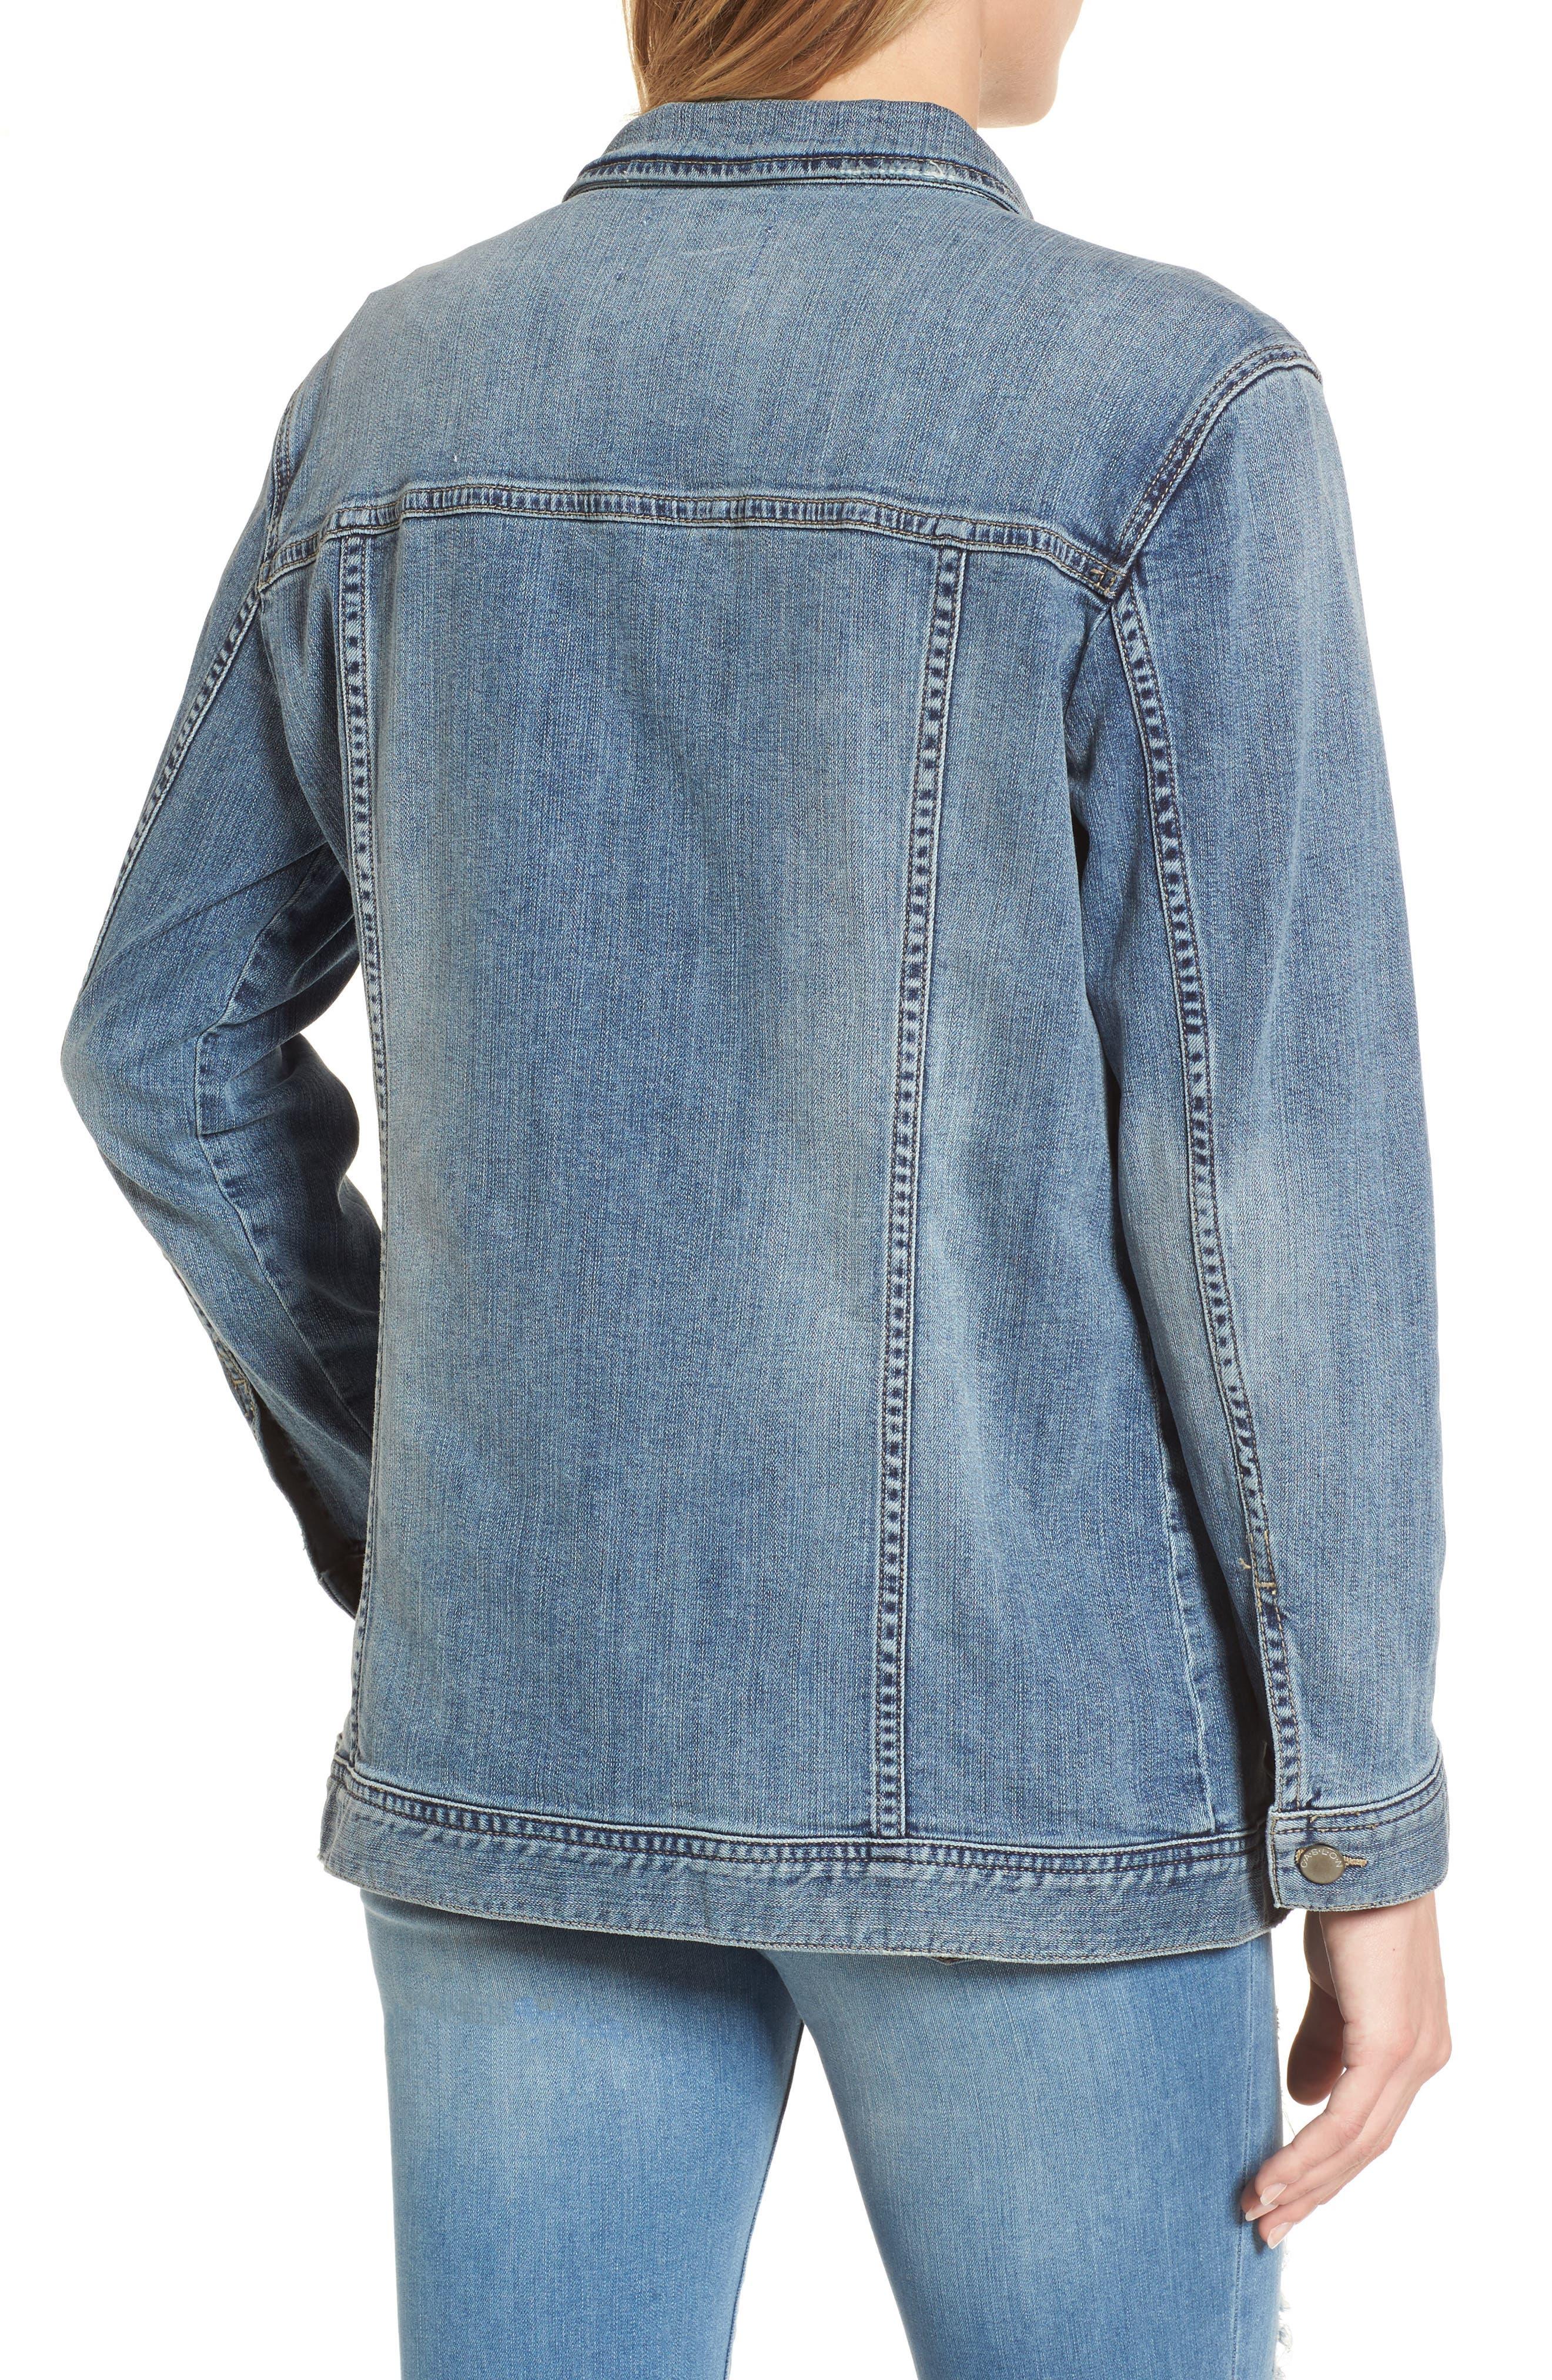 Alternate Image 2  - Caslon® Relaxed Fit Denim Jacket (Regular & Petite)